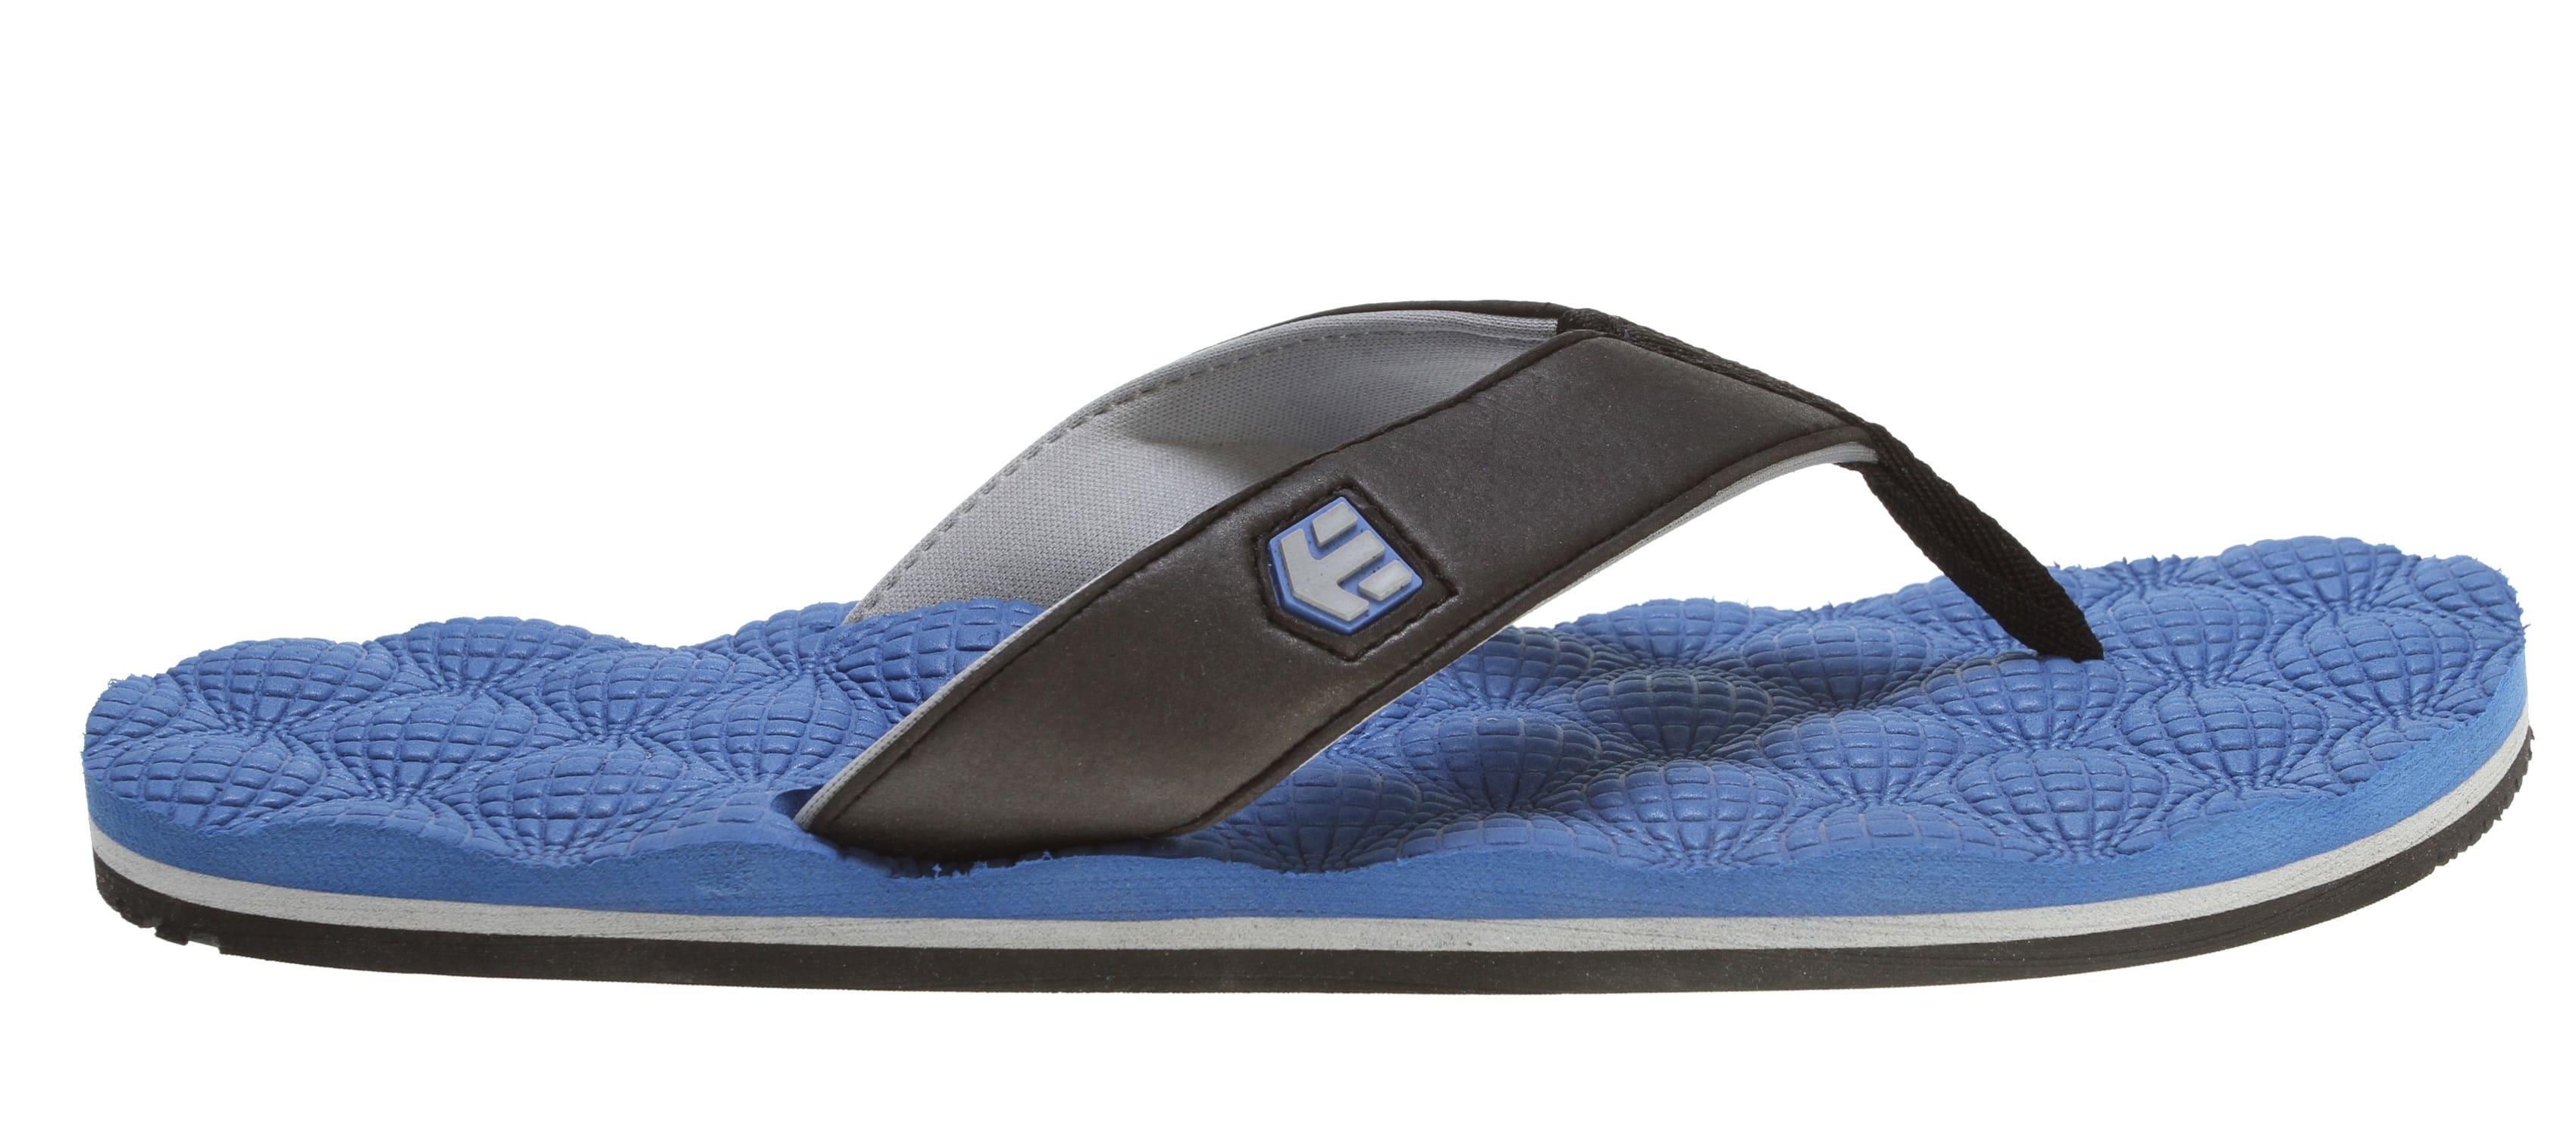 e52c34159 Etnies Foam Ball Sandals - thumbnail 1